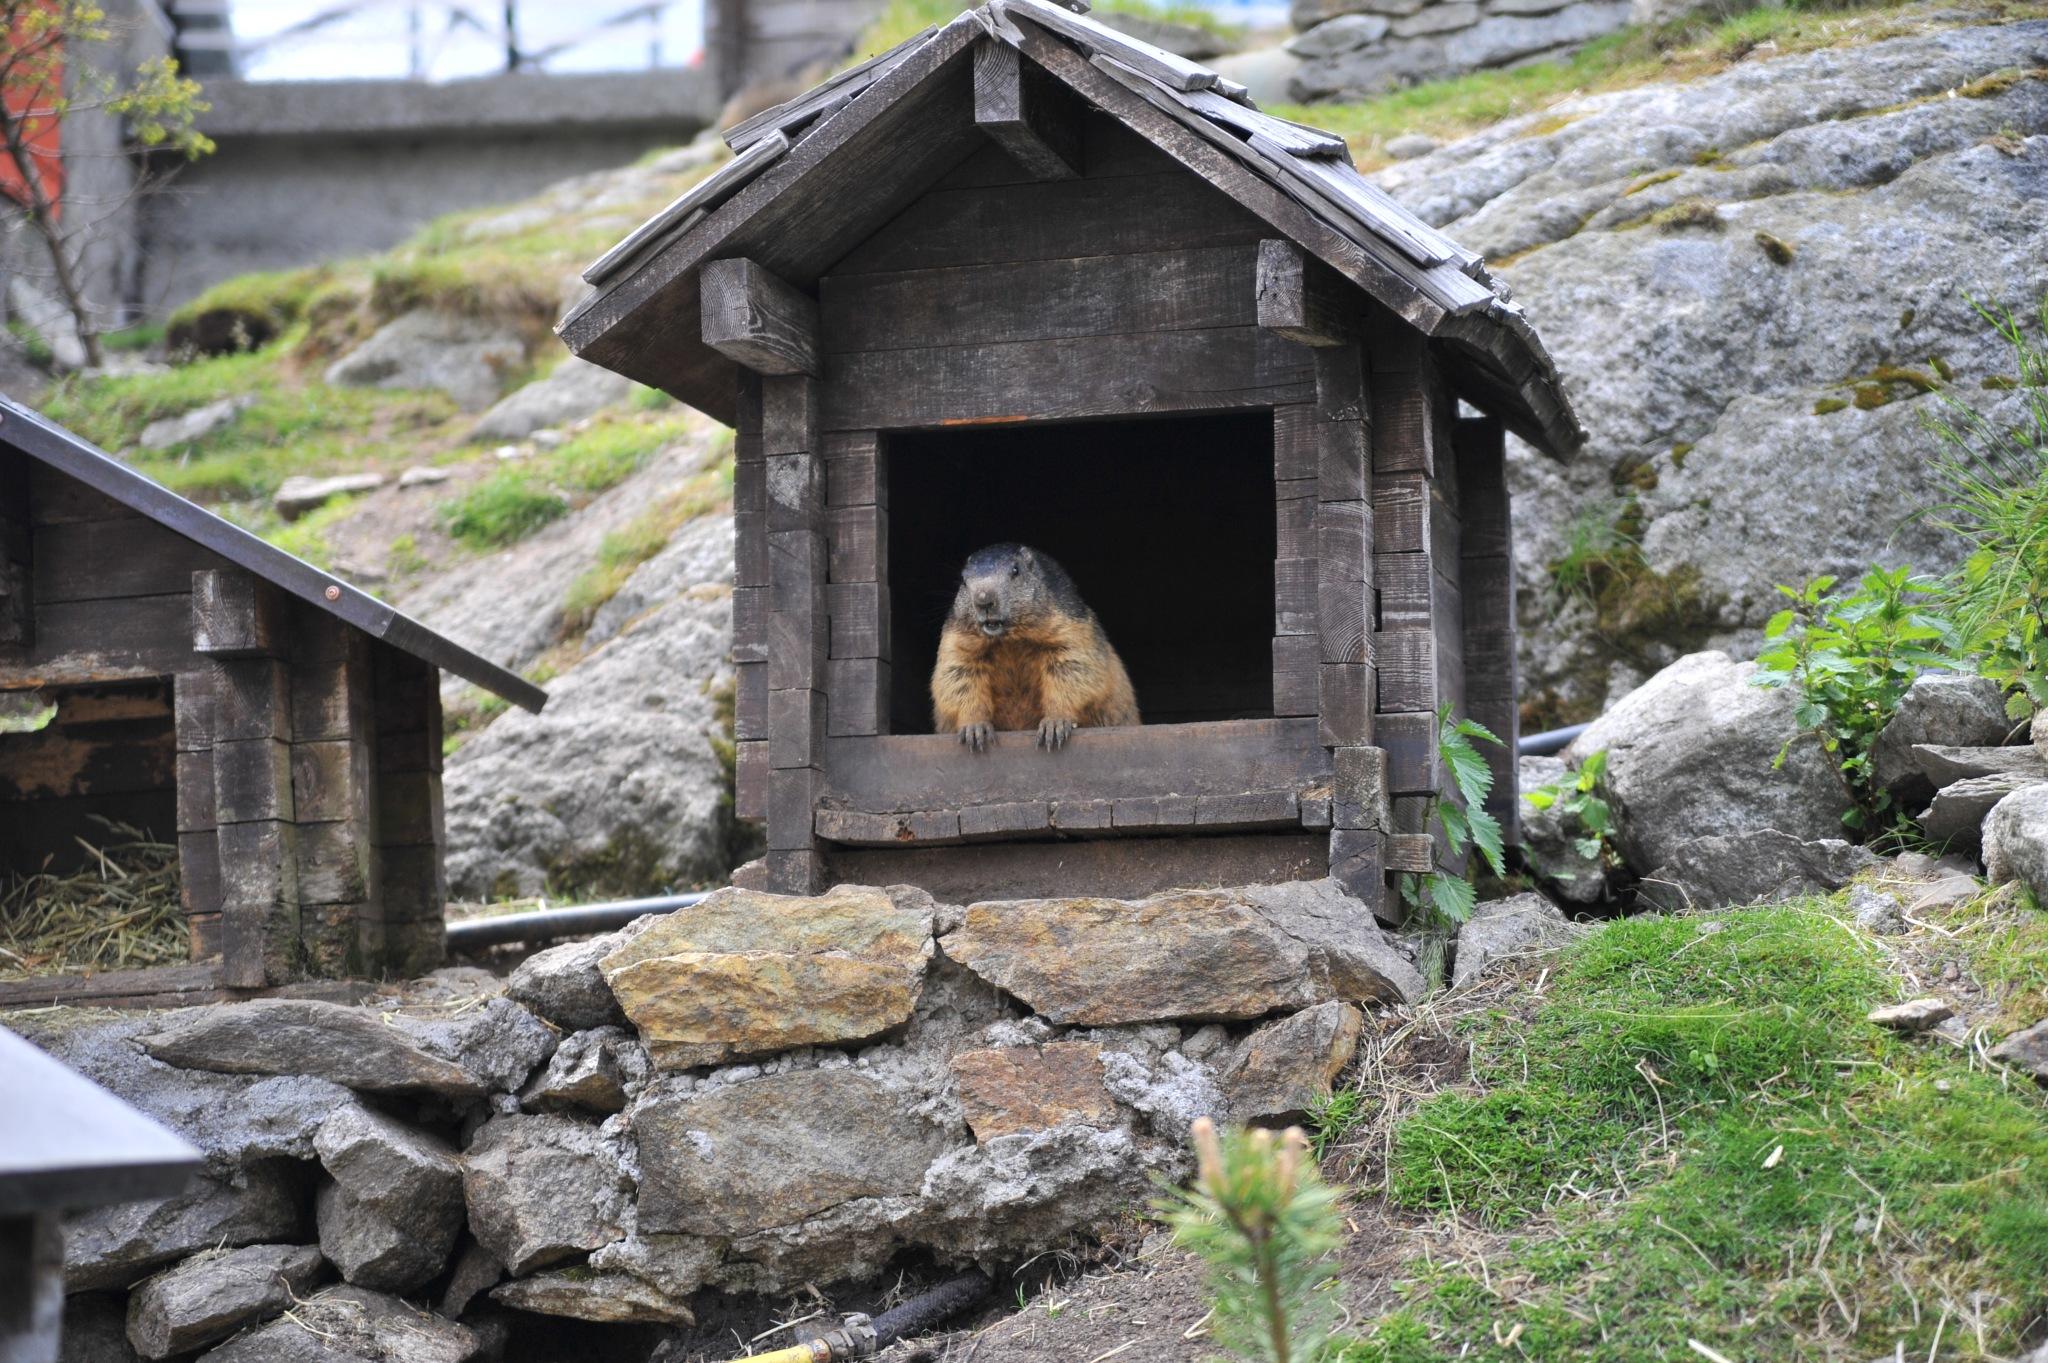 marmots by EsbenDK